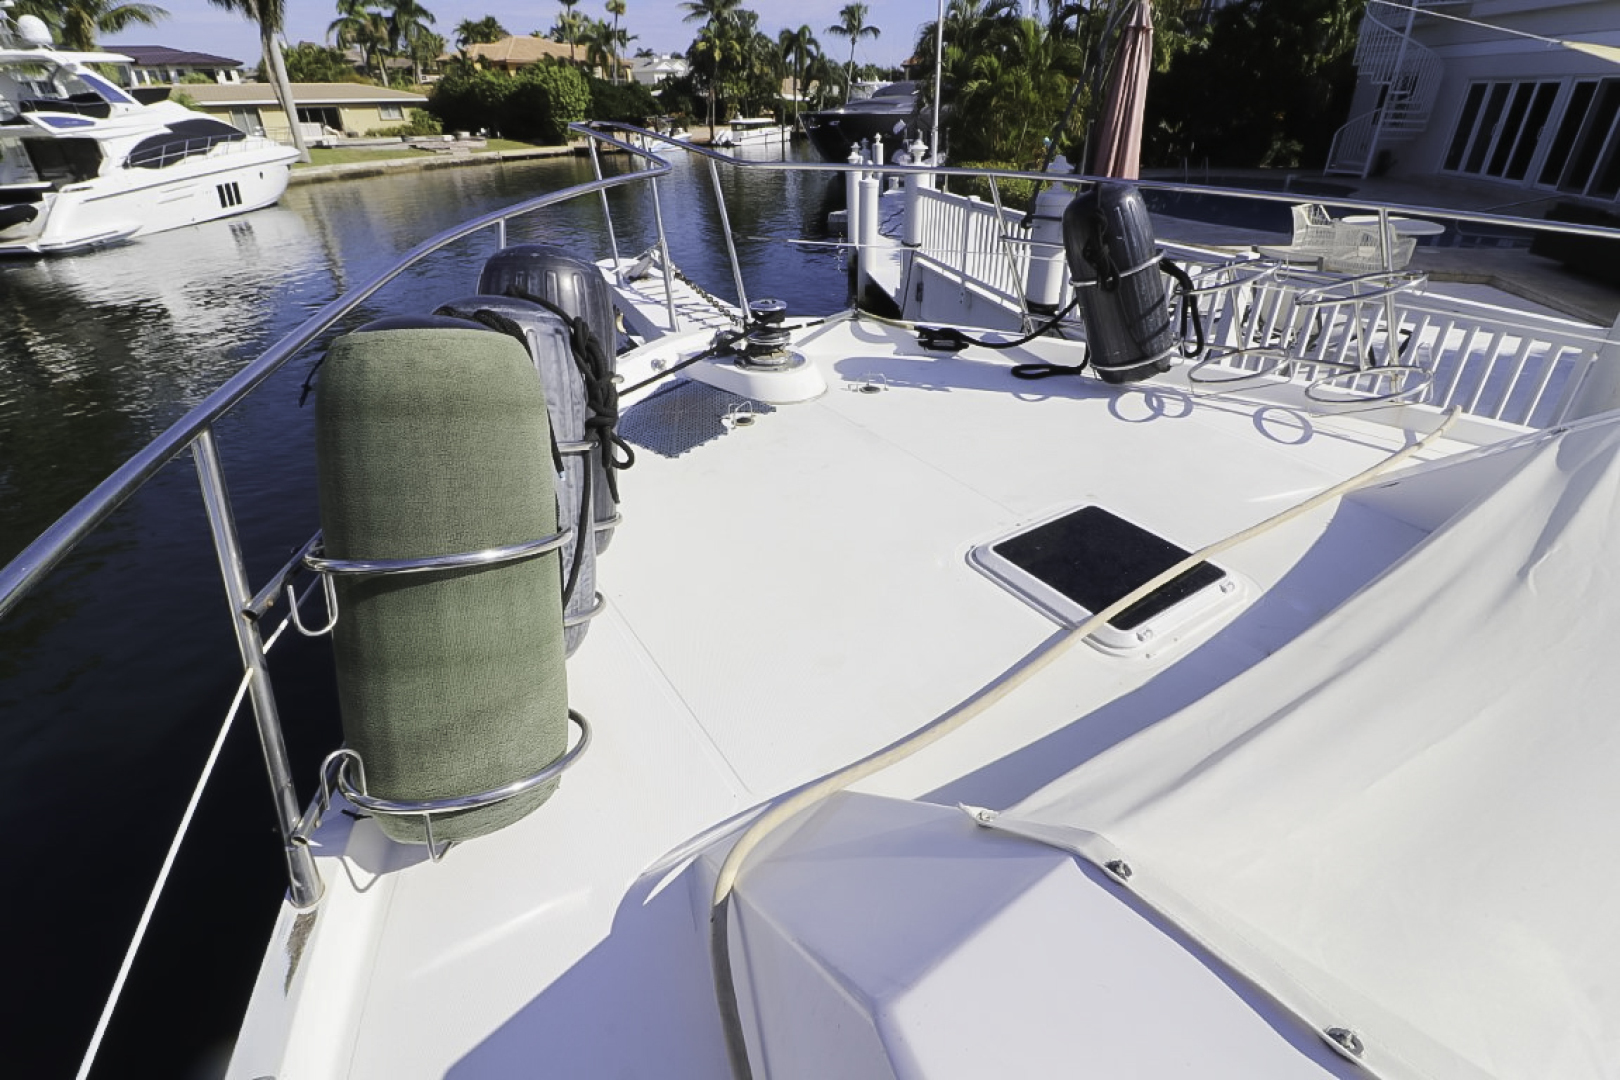 Viking-70 Cockpit Motor Yacht 1988 -Fort Lauderdale-Florida-United States-1593859   Thumbnail